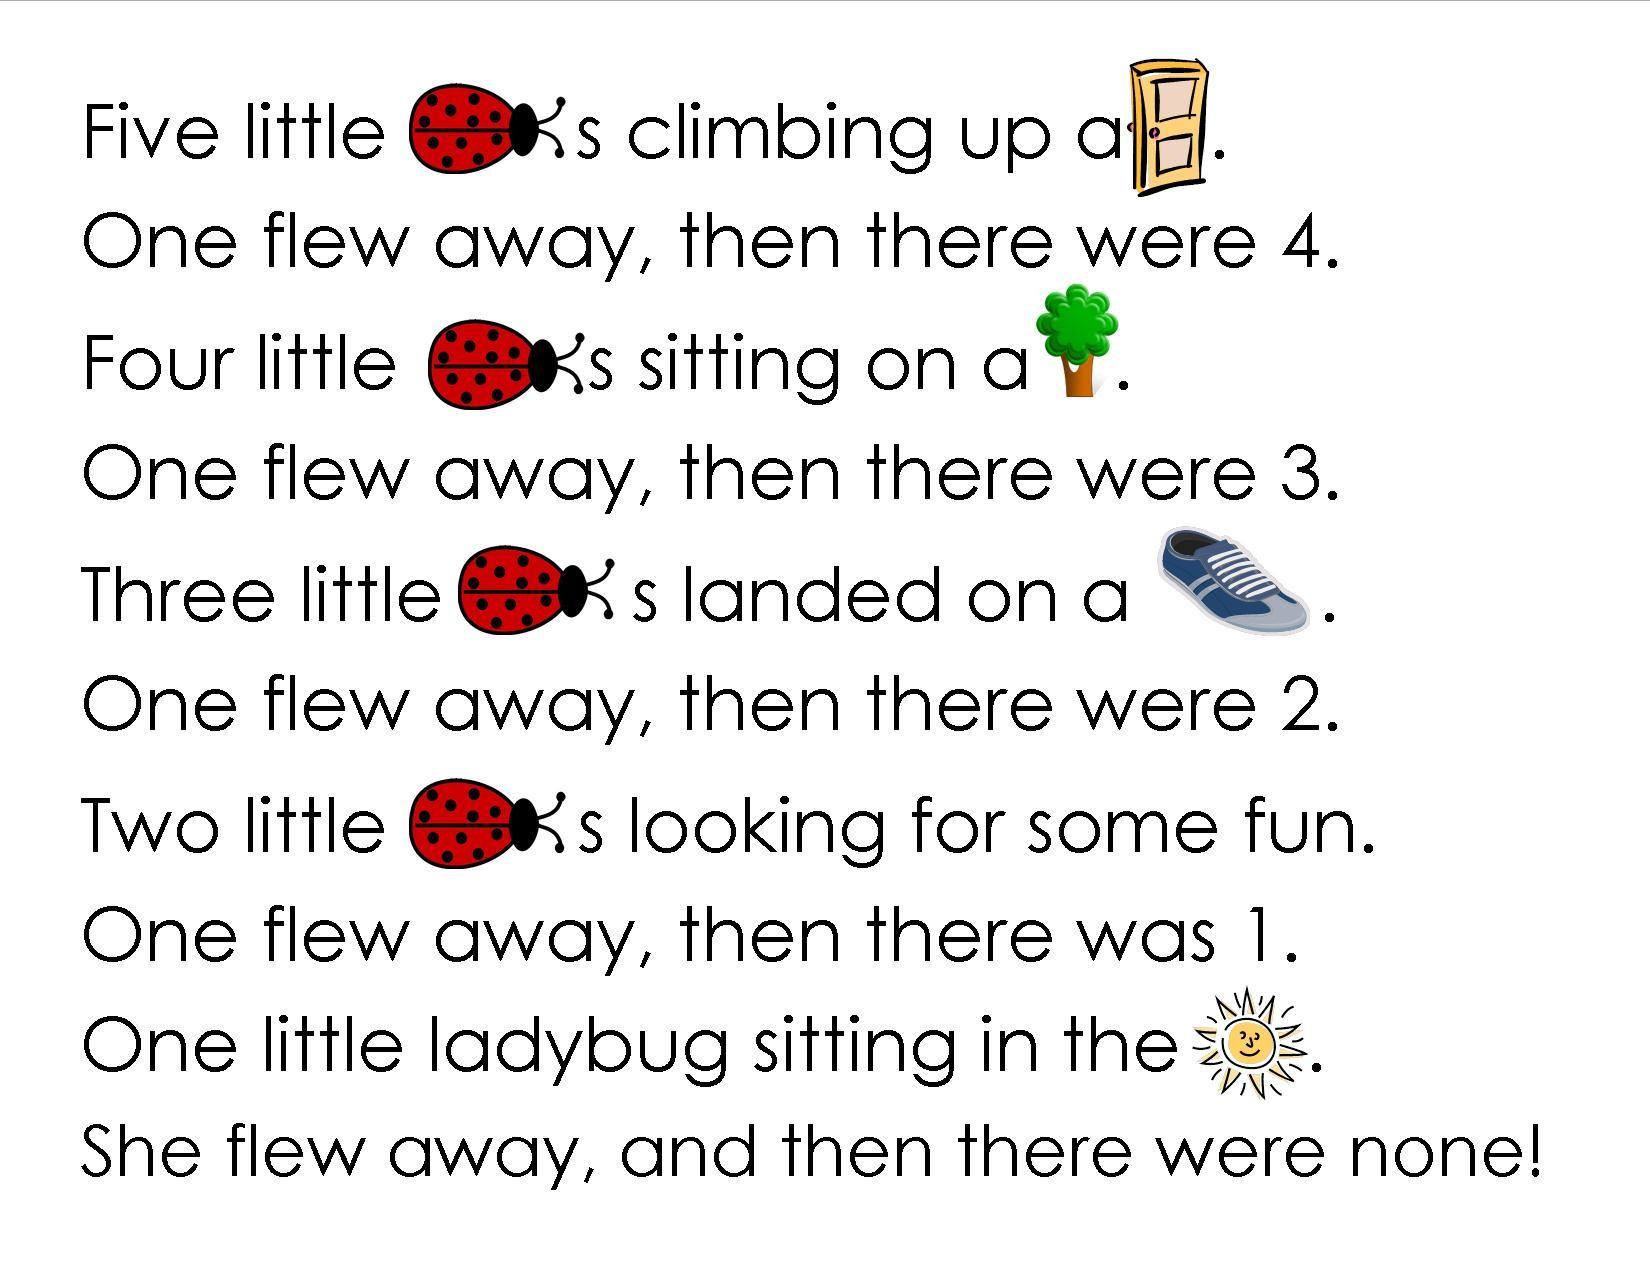 worksheet Ladybug Counting Worksheet ladybug worksheet for first grade activity sheet that goes along with the